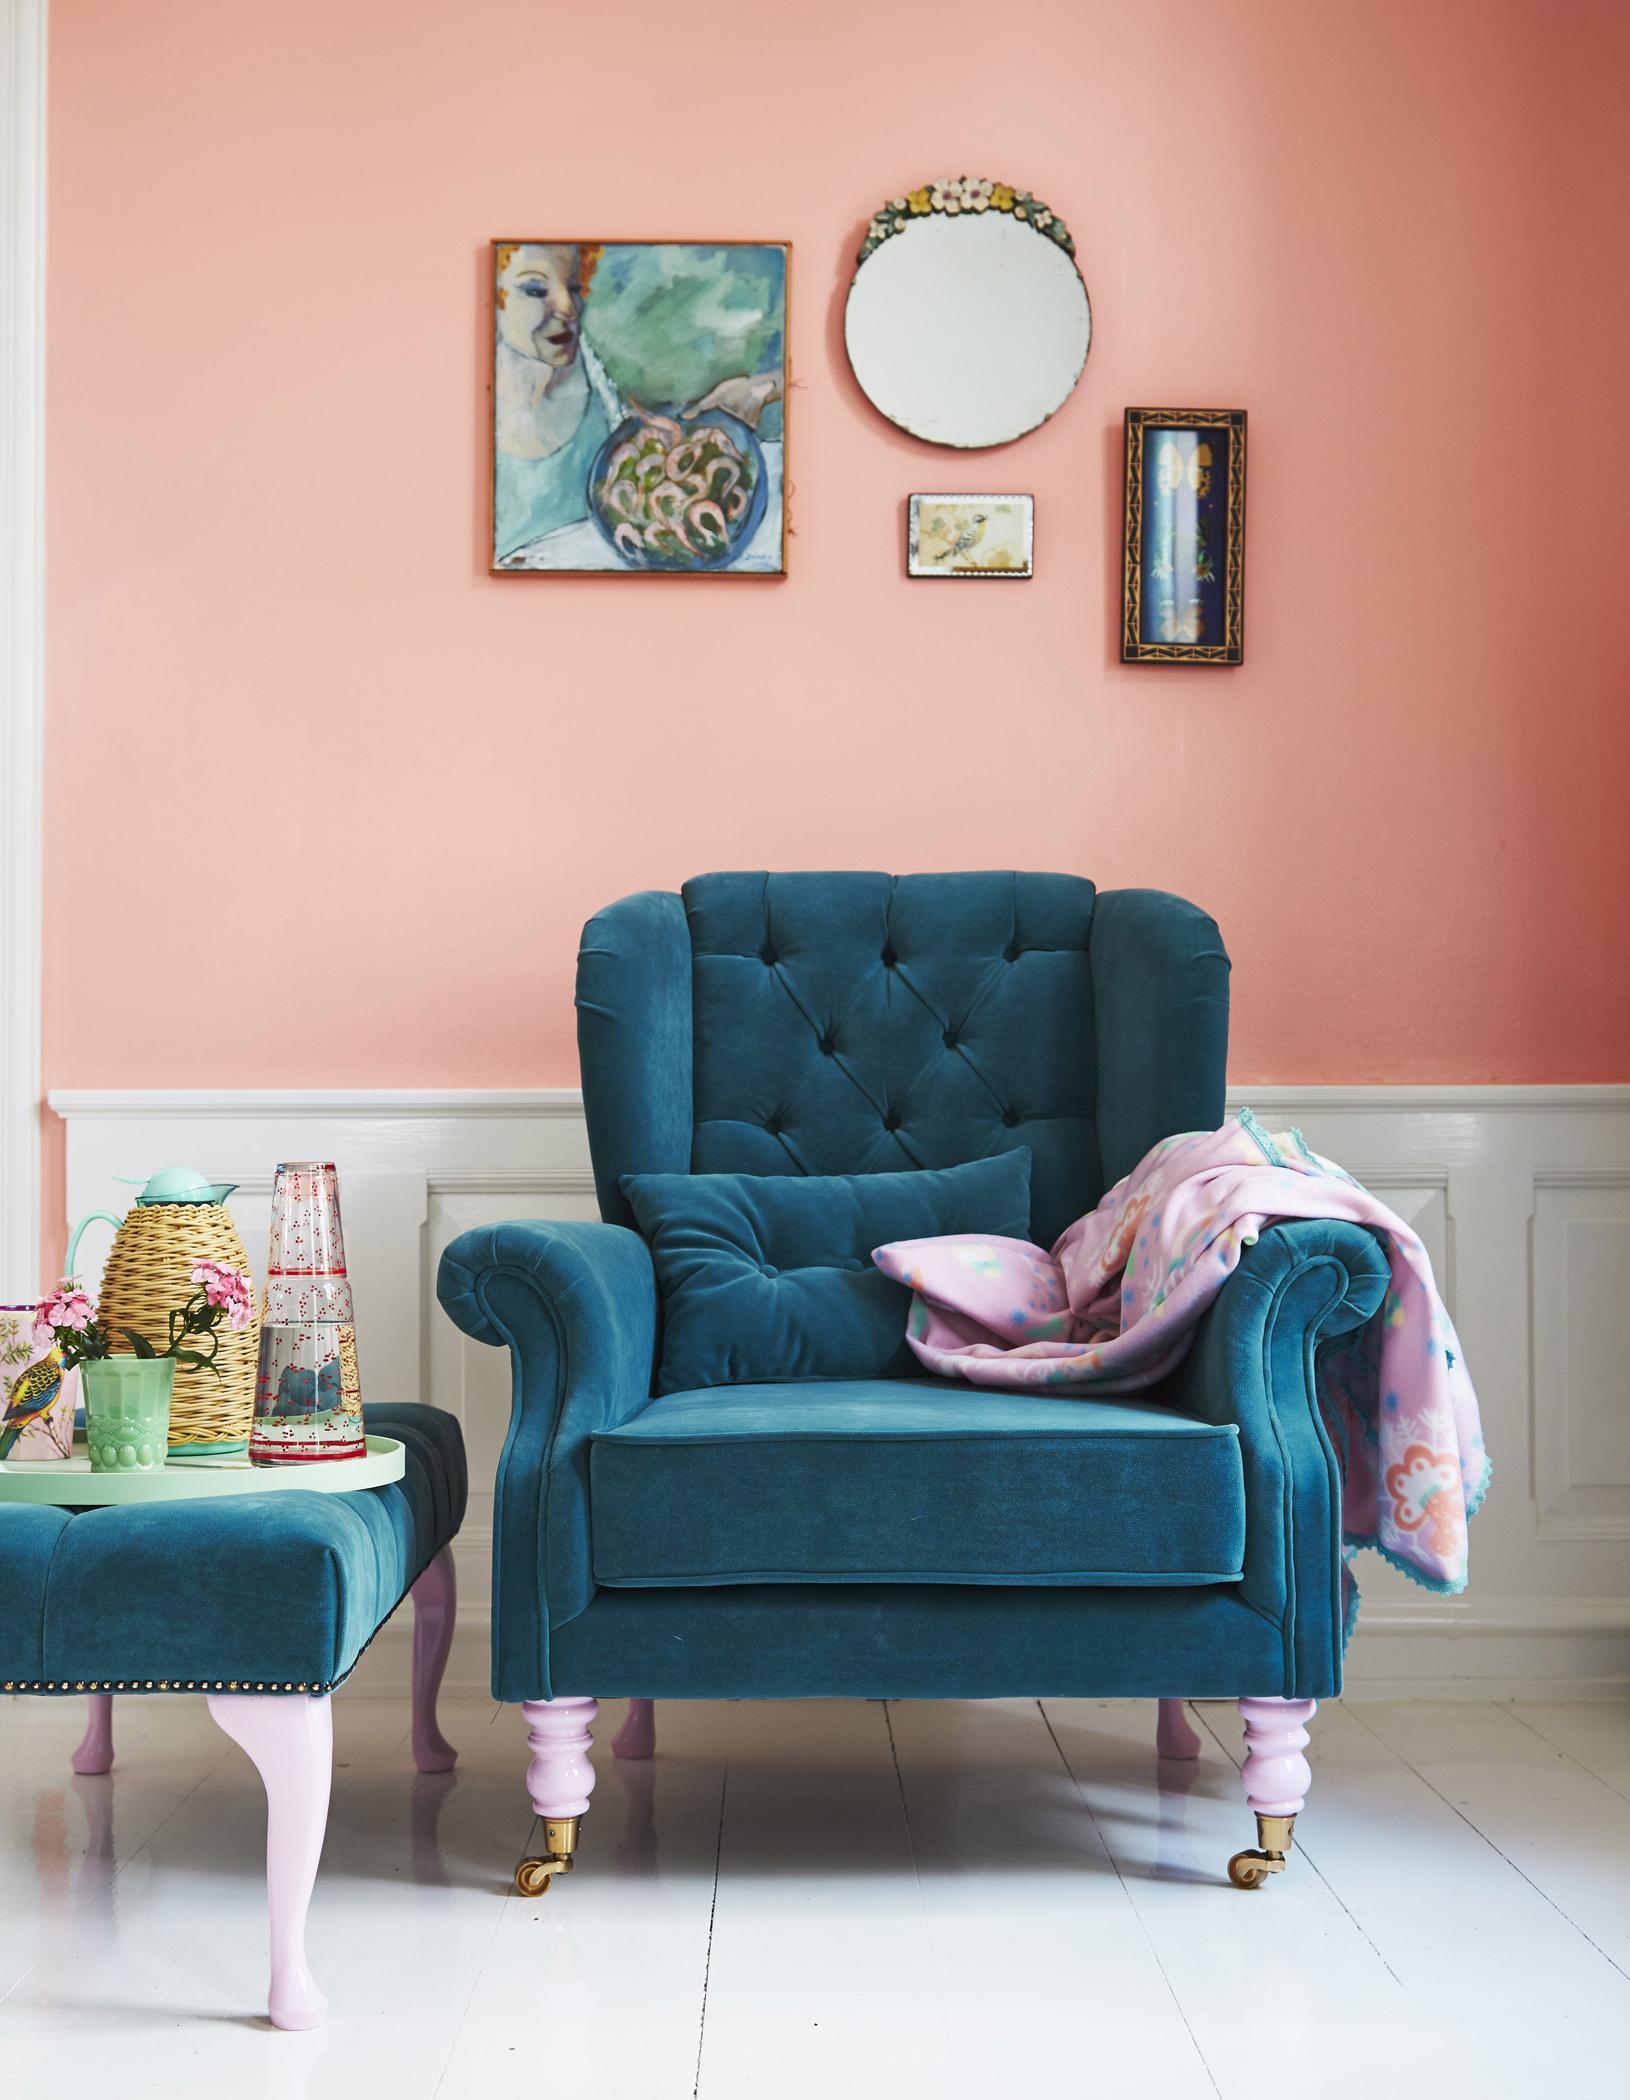 Apricot Wandfarbe Schmeichelt Petrolfarbenem Sessel #dielenboden #hocker # Wohnzimmer #sessel #bilder